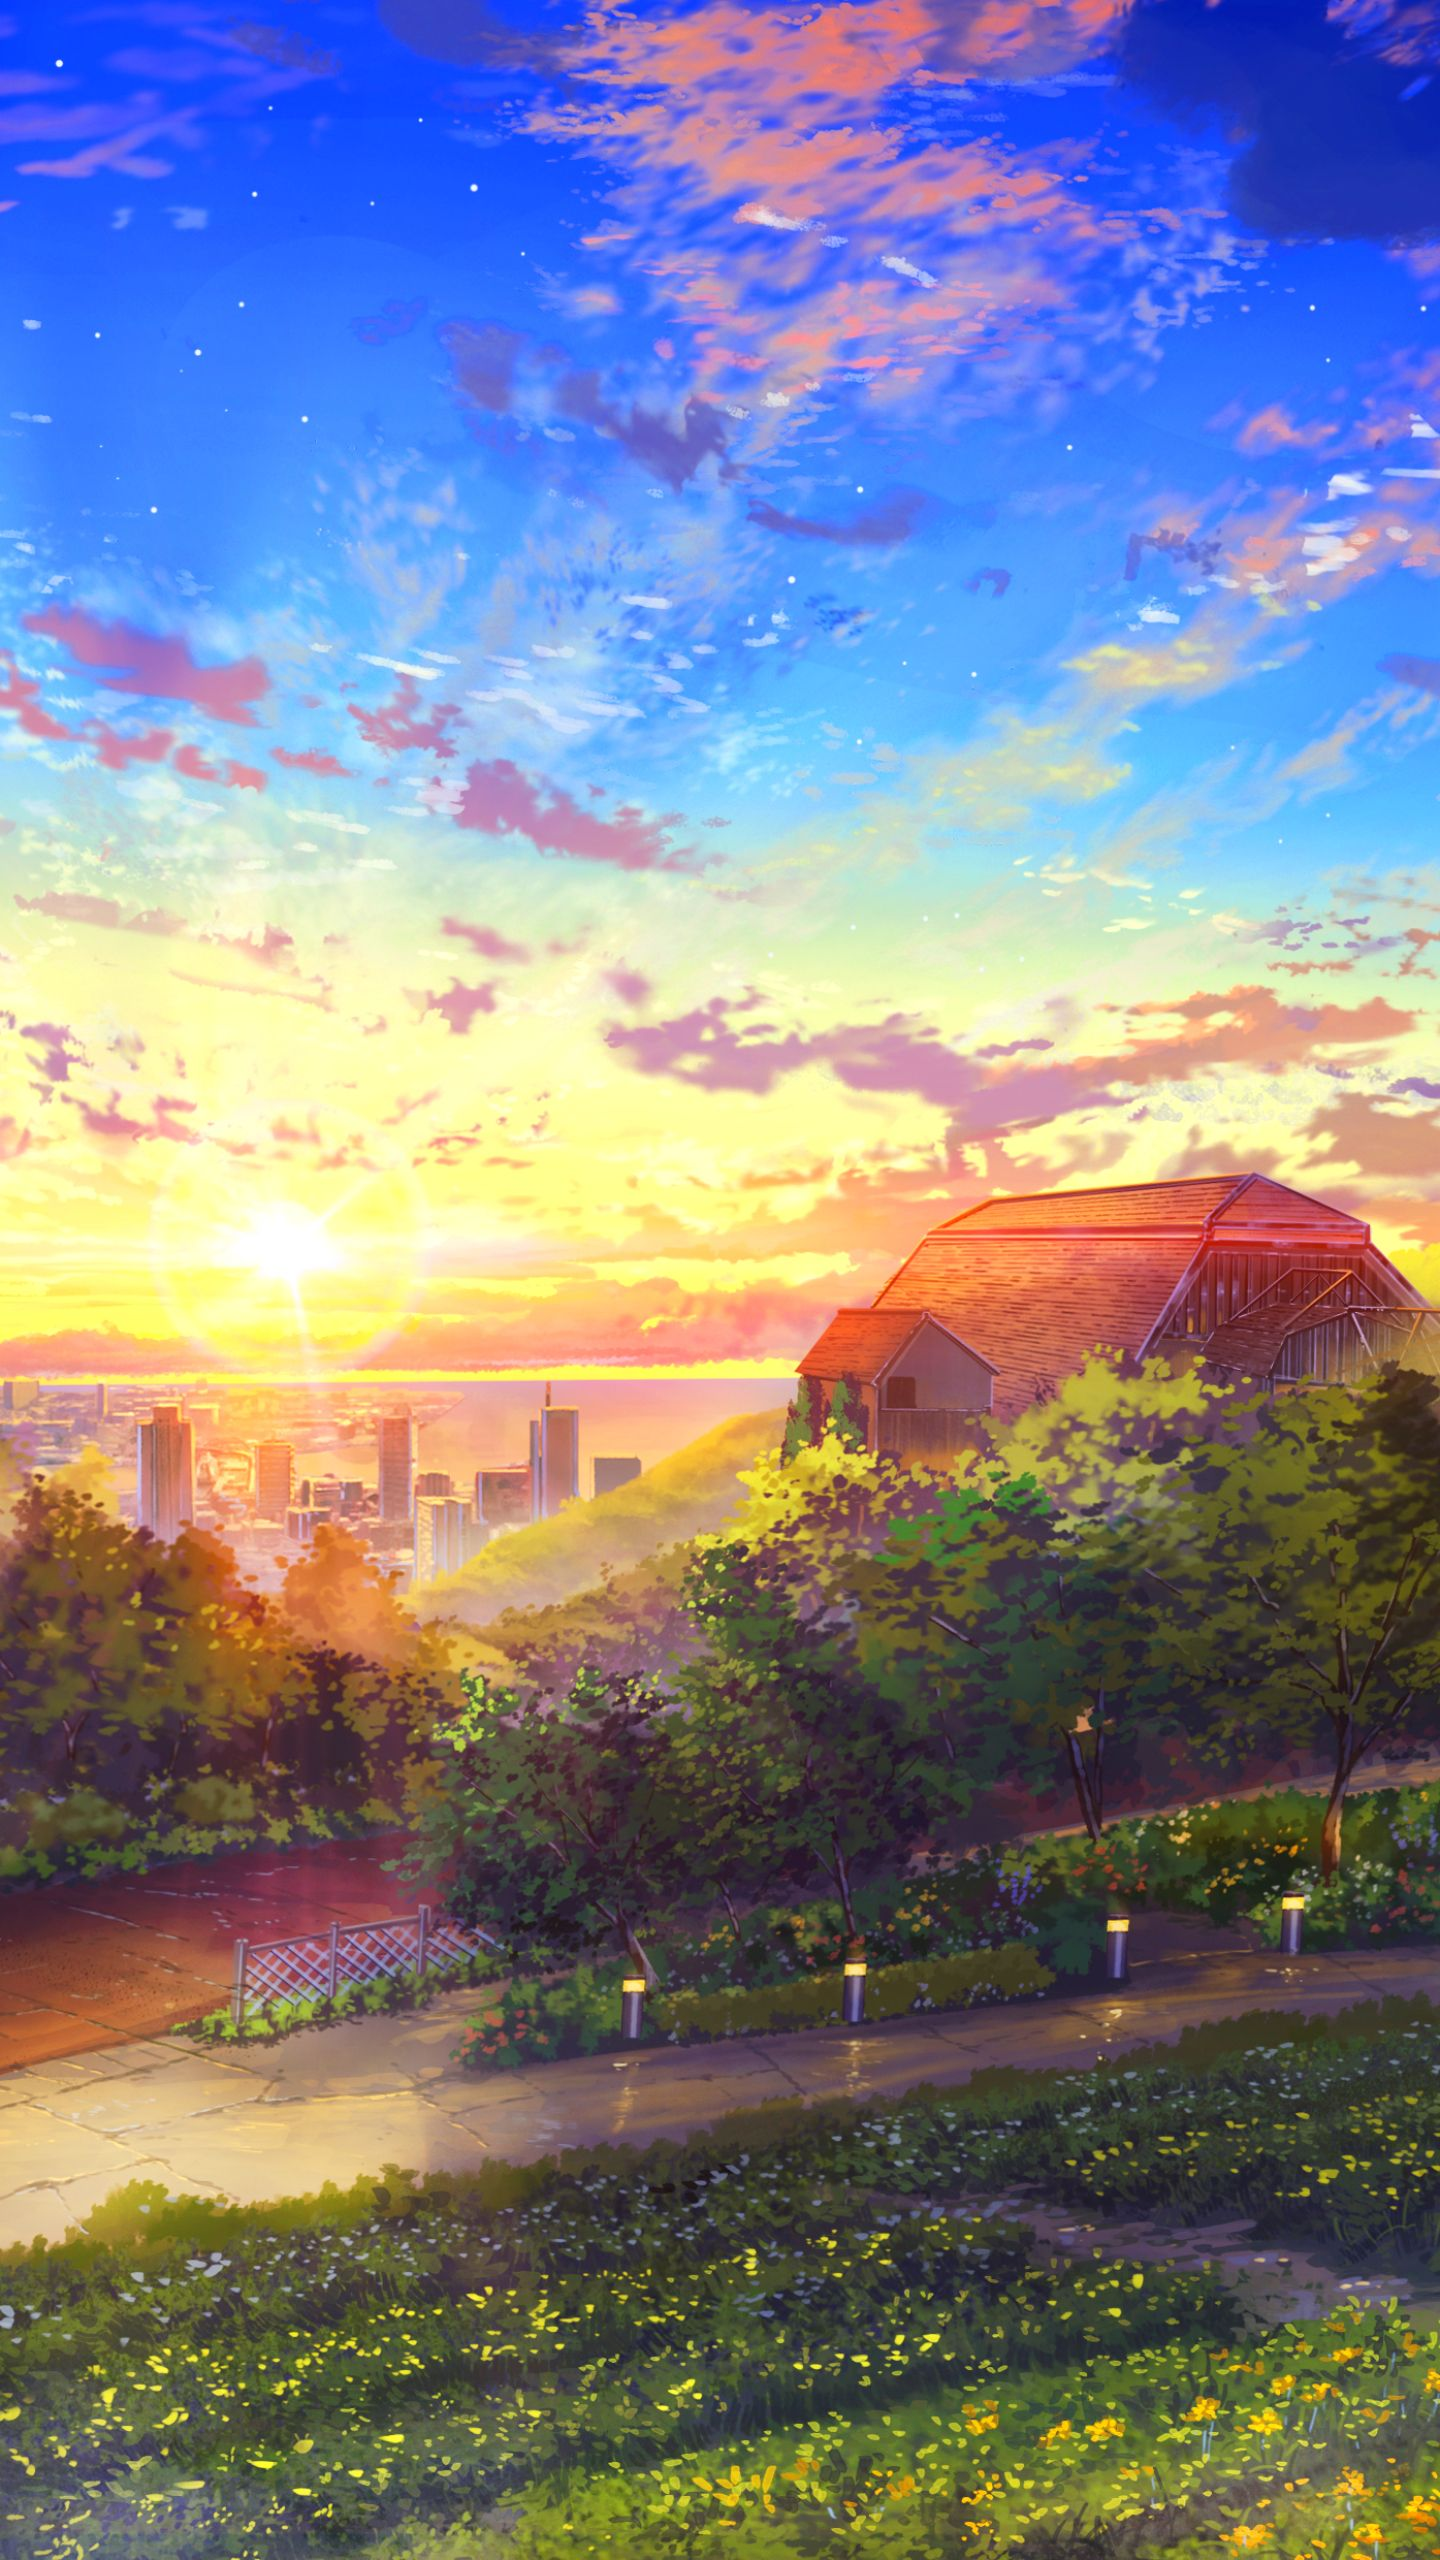 Anime Landscape Wallpaper Phone di 2020 1440x2560